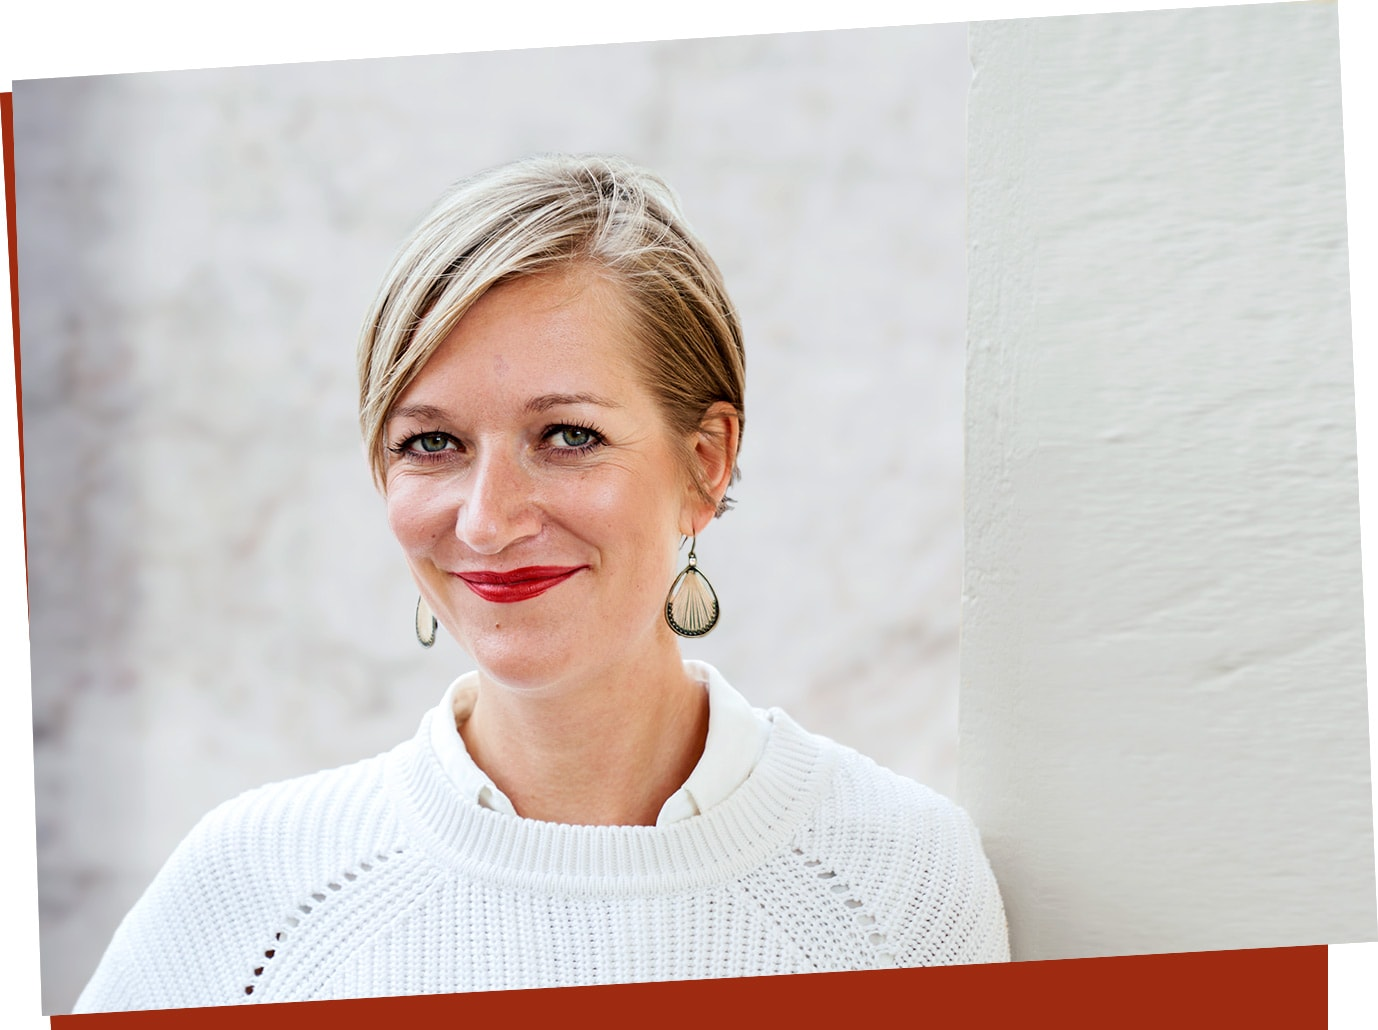 Janina Dölle, Teamleiterin von 15 Call Agents bei EOS in Potsdam